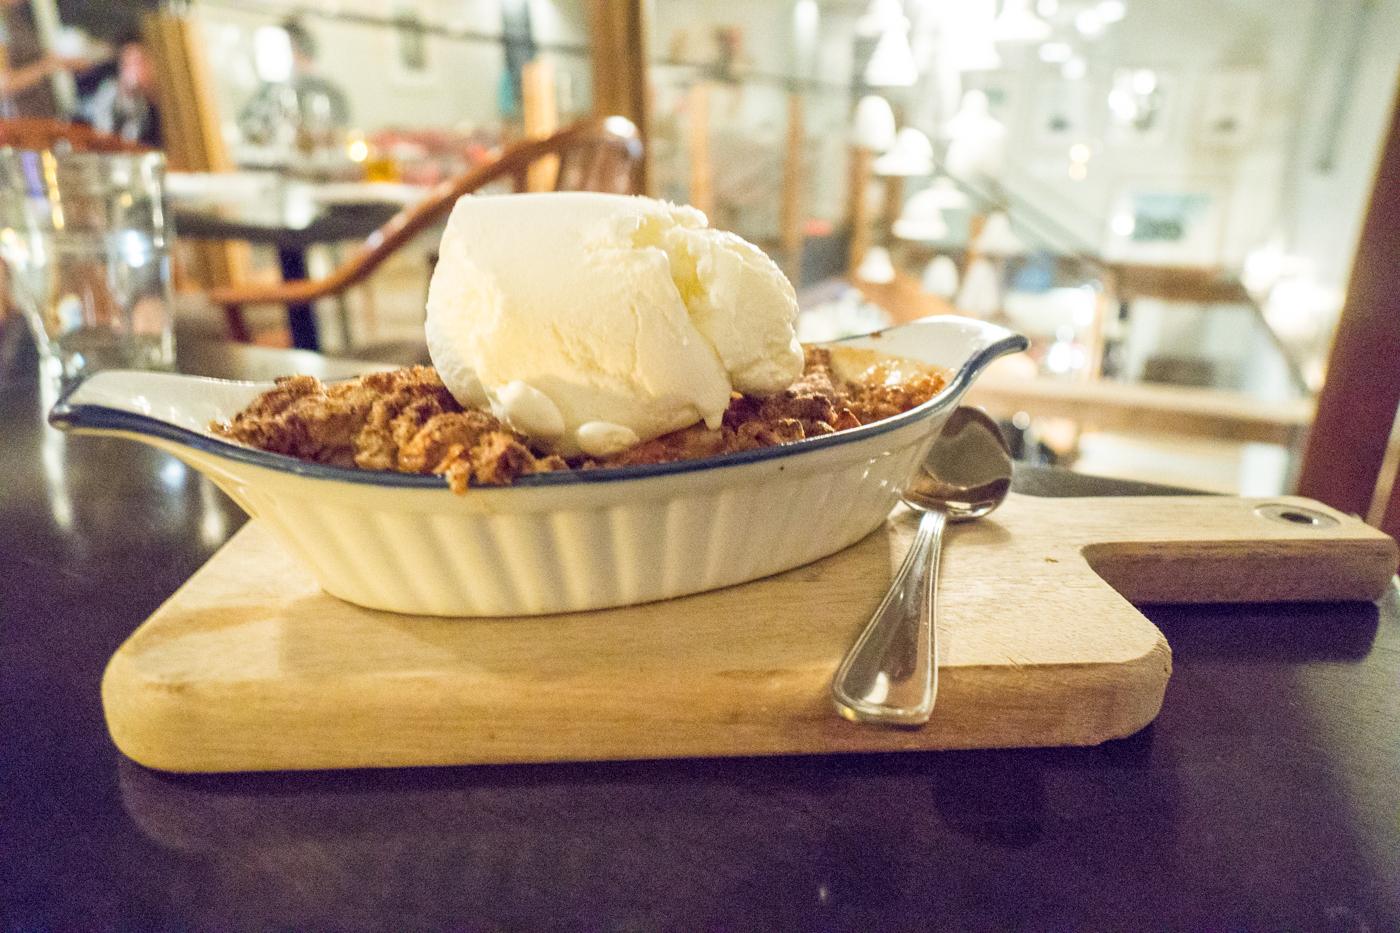 Croustade aux pommes en dessert - Où manger en Mauricie